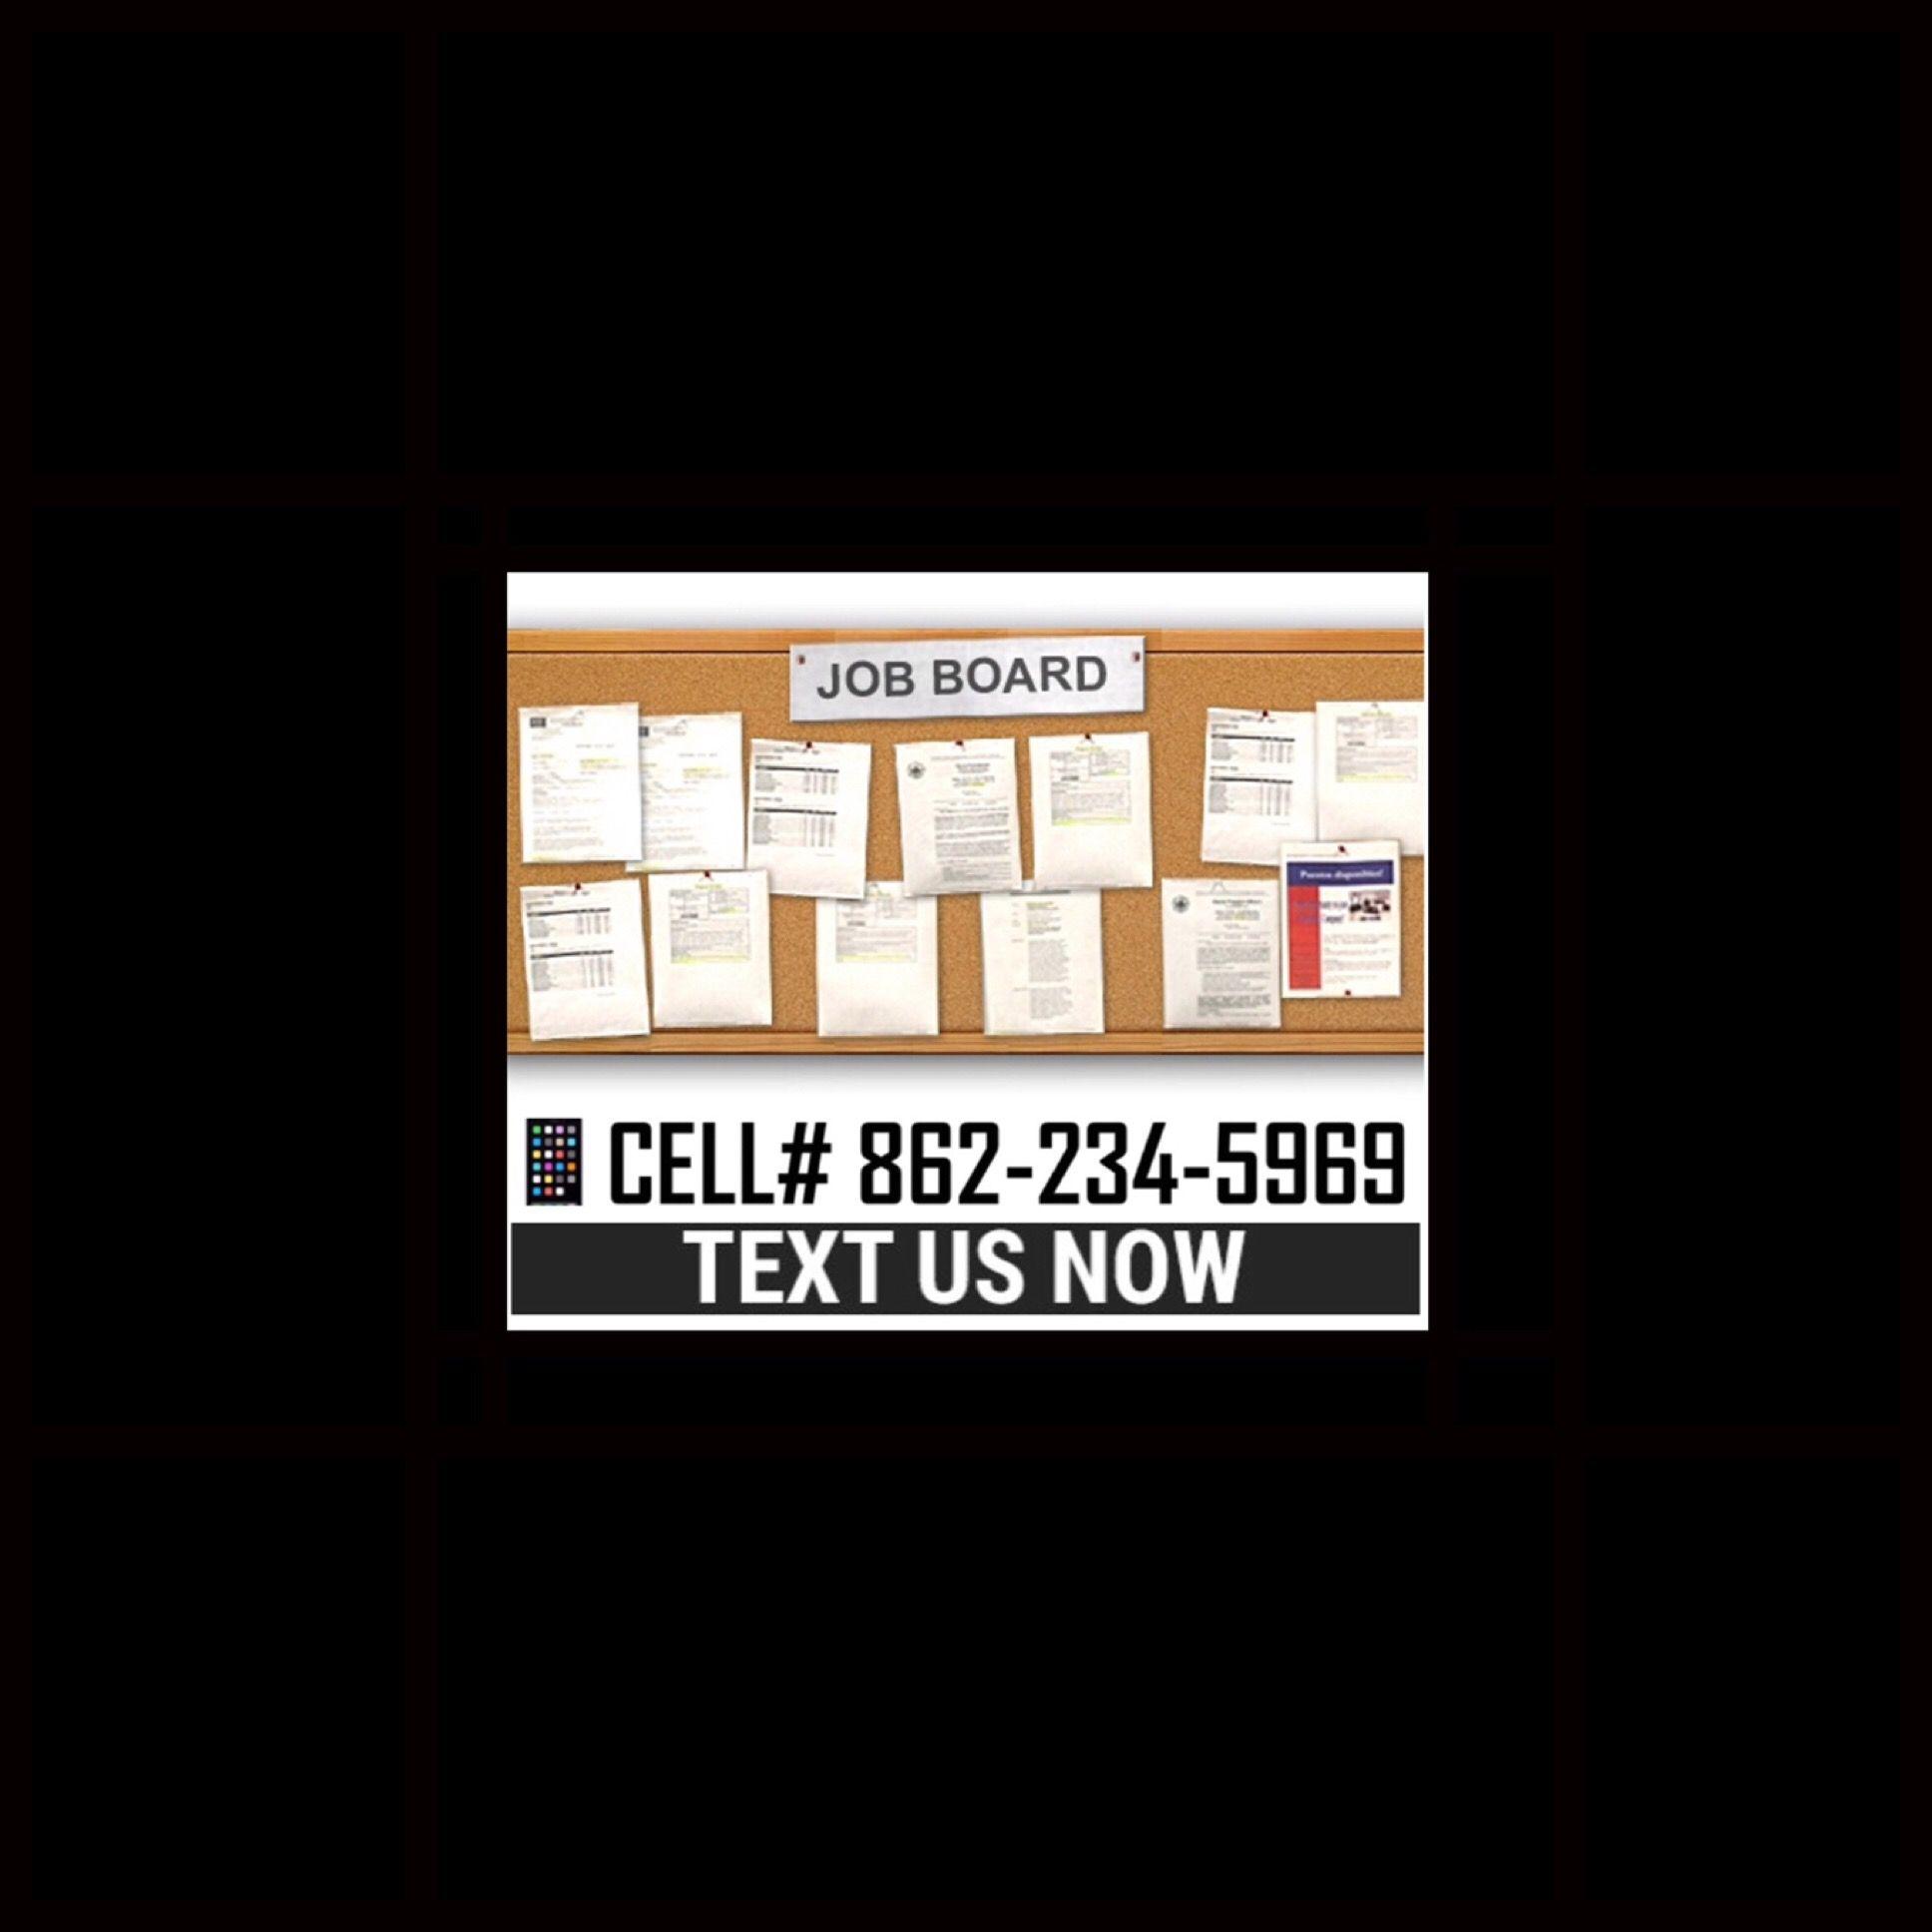 allentown health bureau jobs